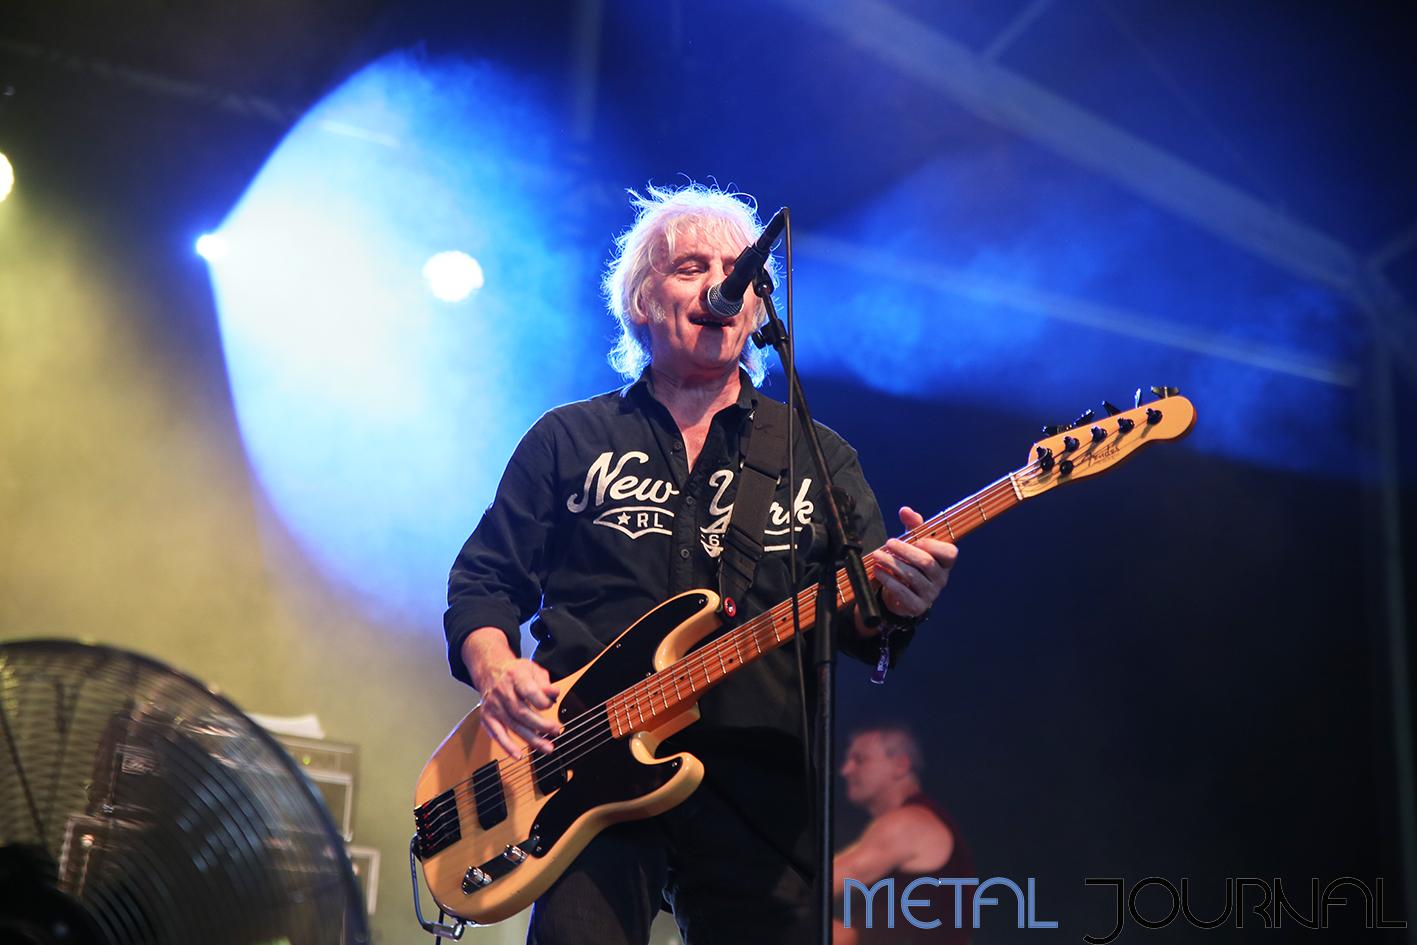 fm - metal journal rock fest barcelona 2019 pic 7